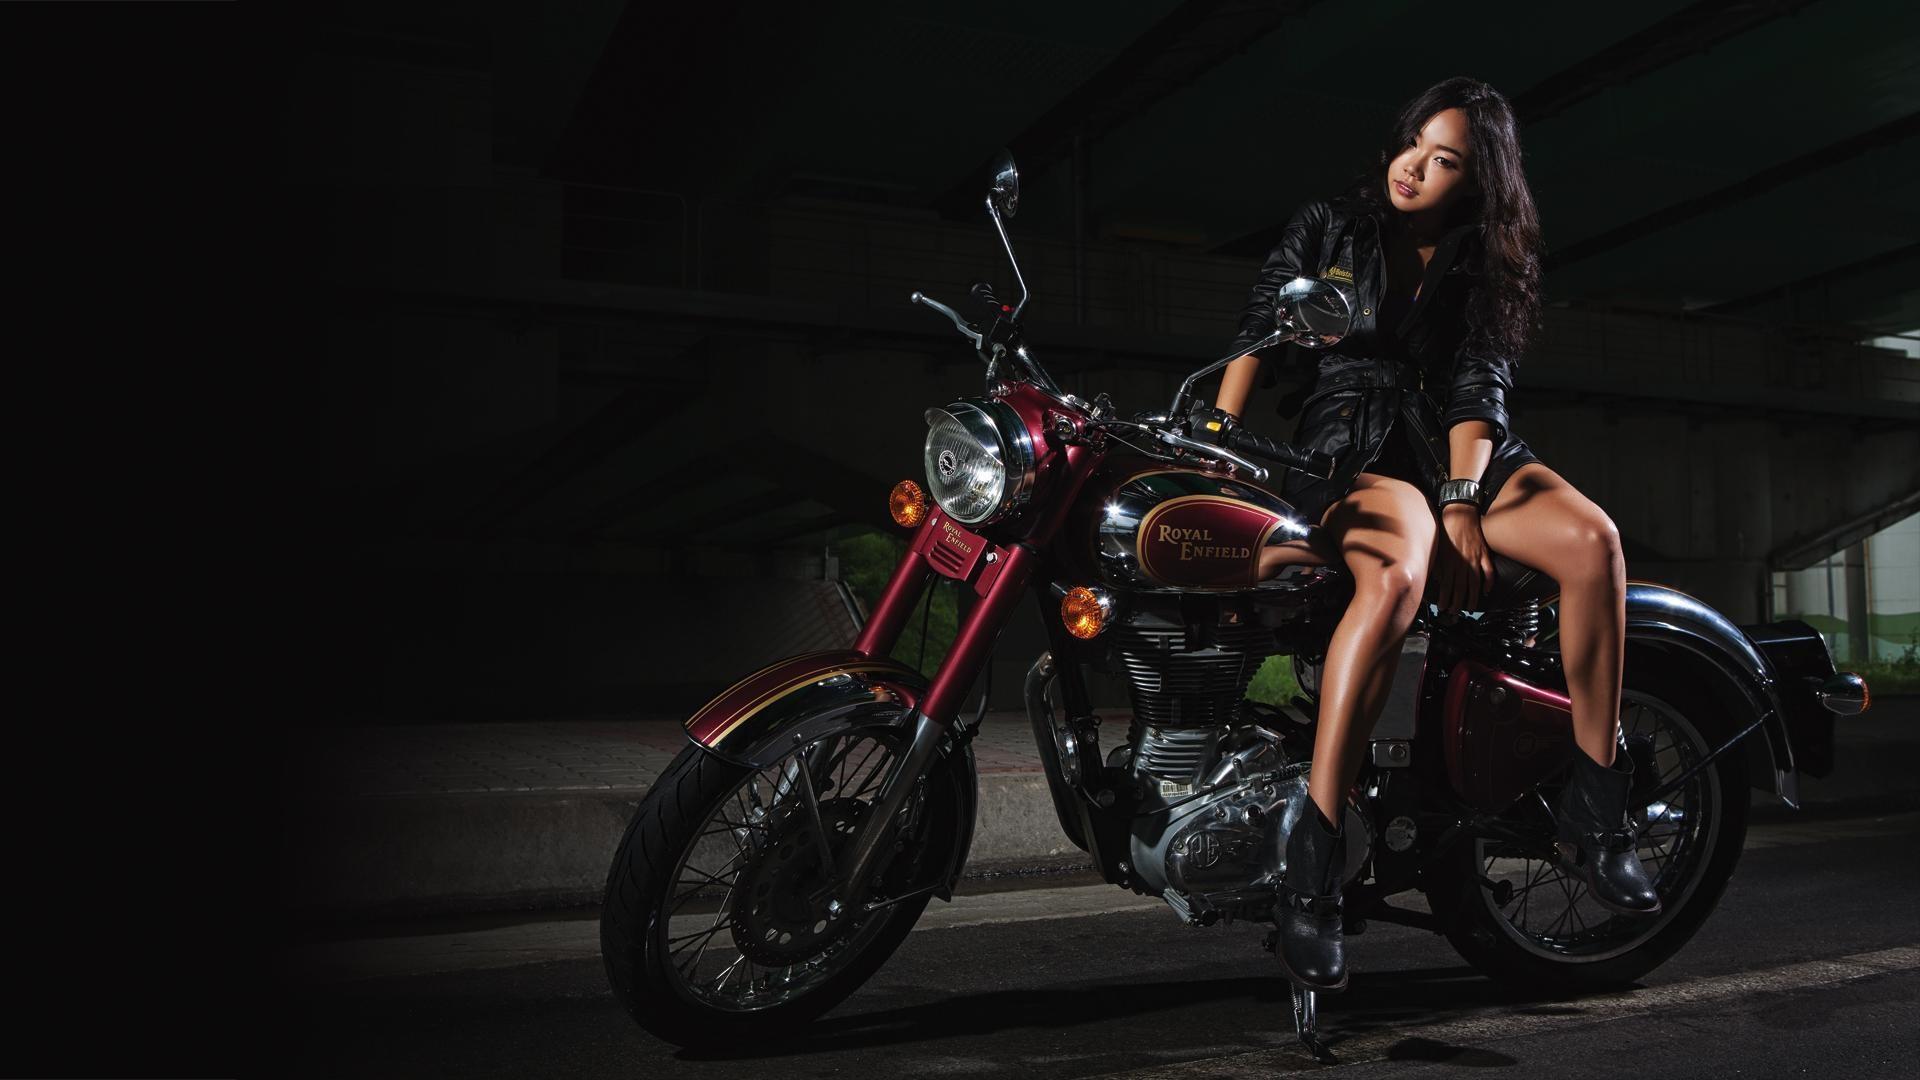 royal-enfield-motorcycle-girl-wallpaper-1920x1080